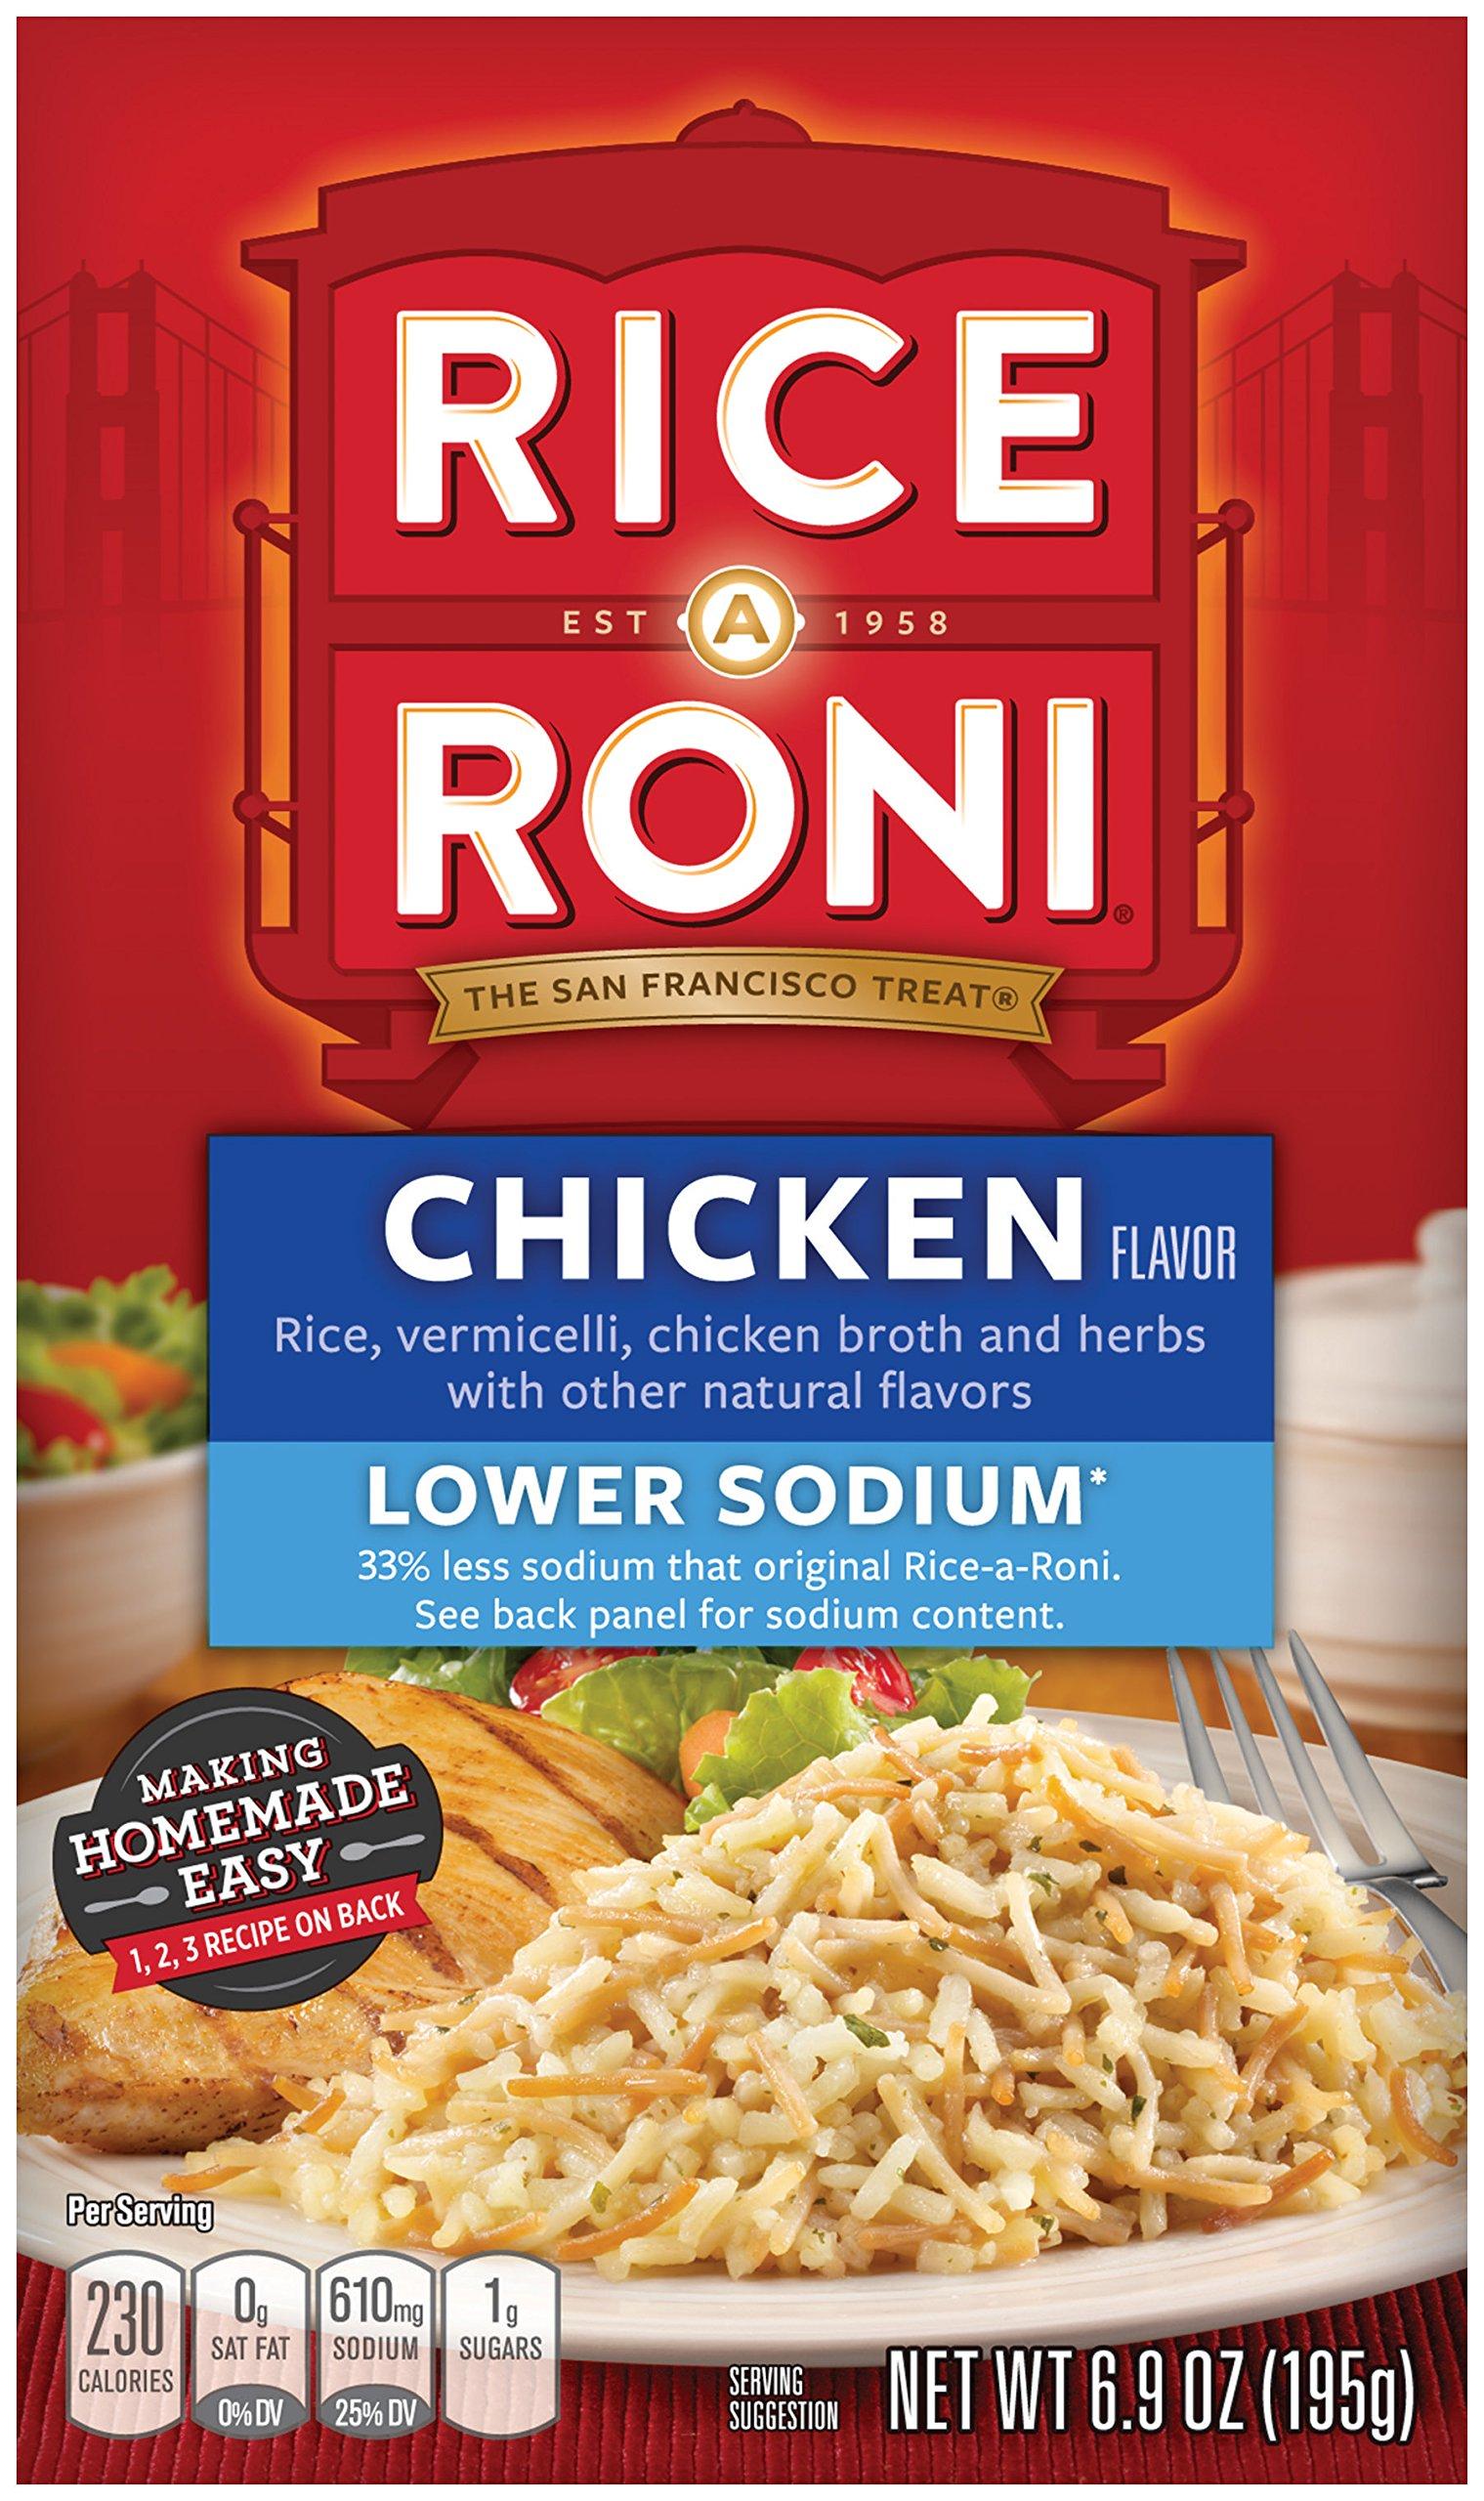 Quaker Rice-A-Roni chicken flavor,net weight 6.9 ounce